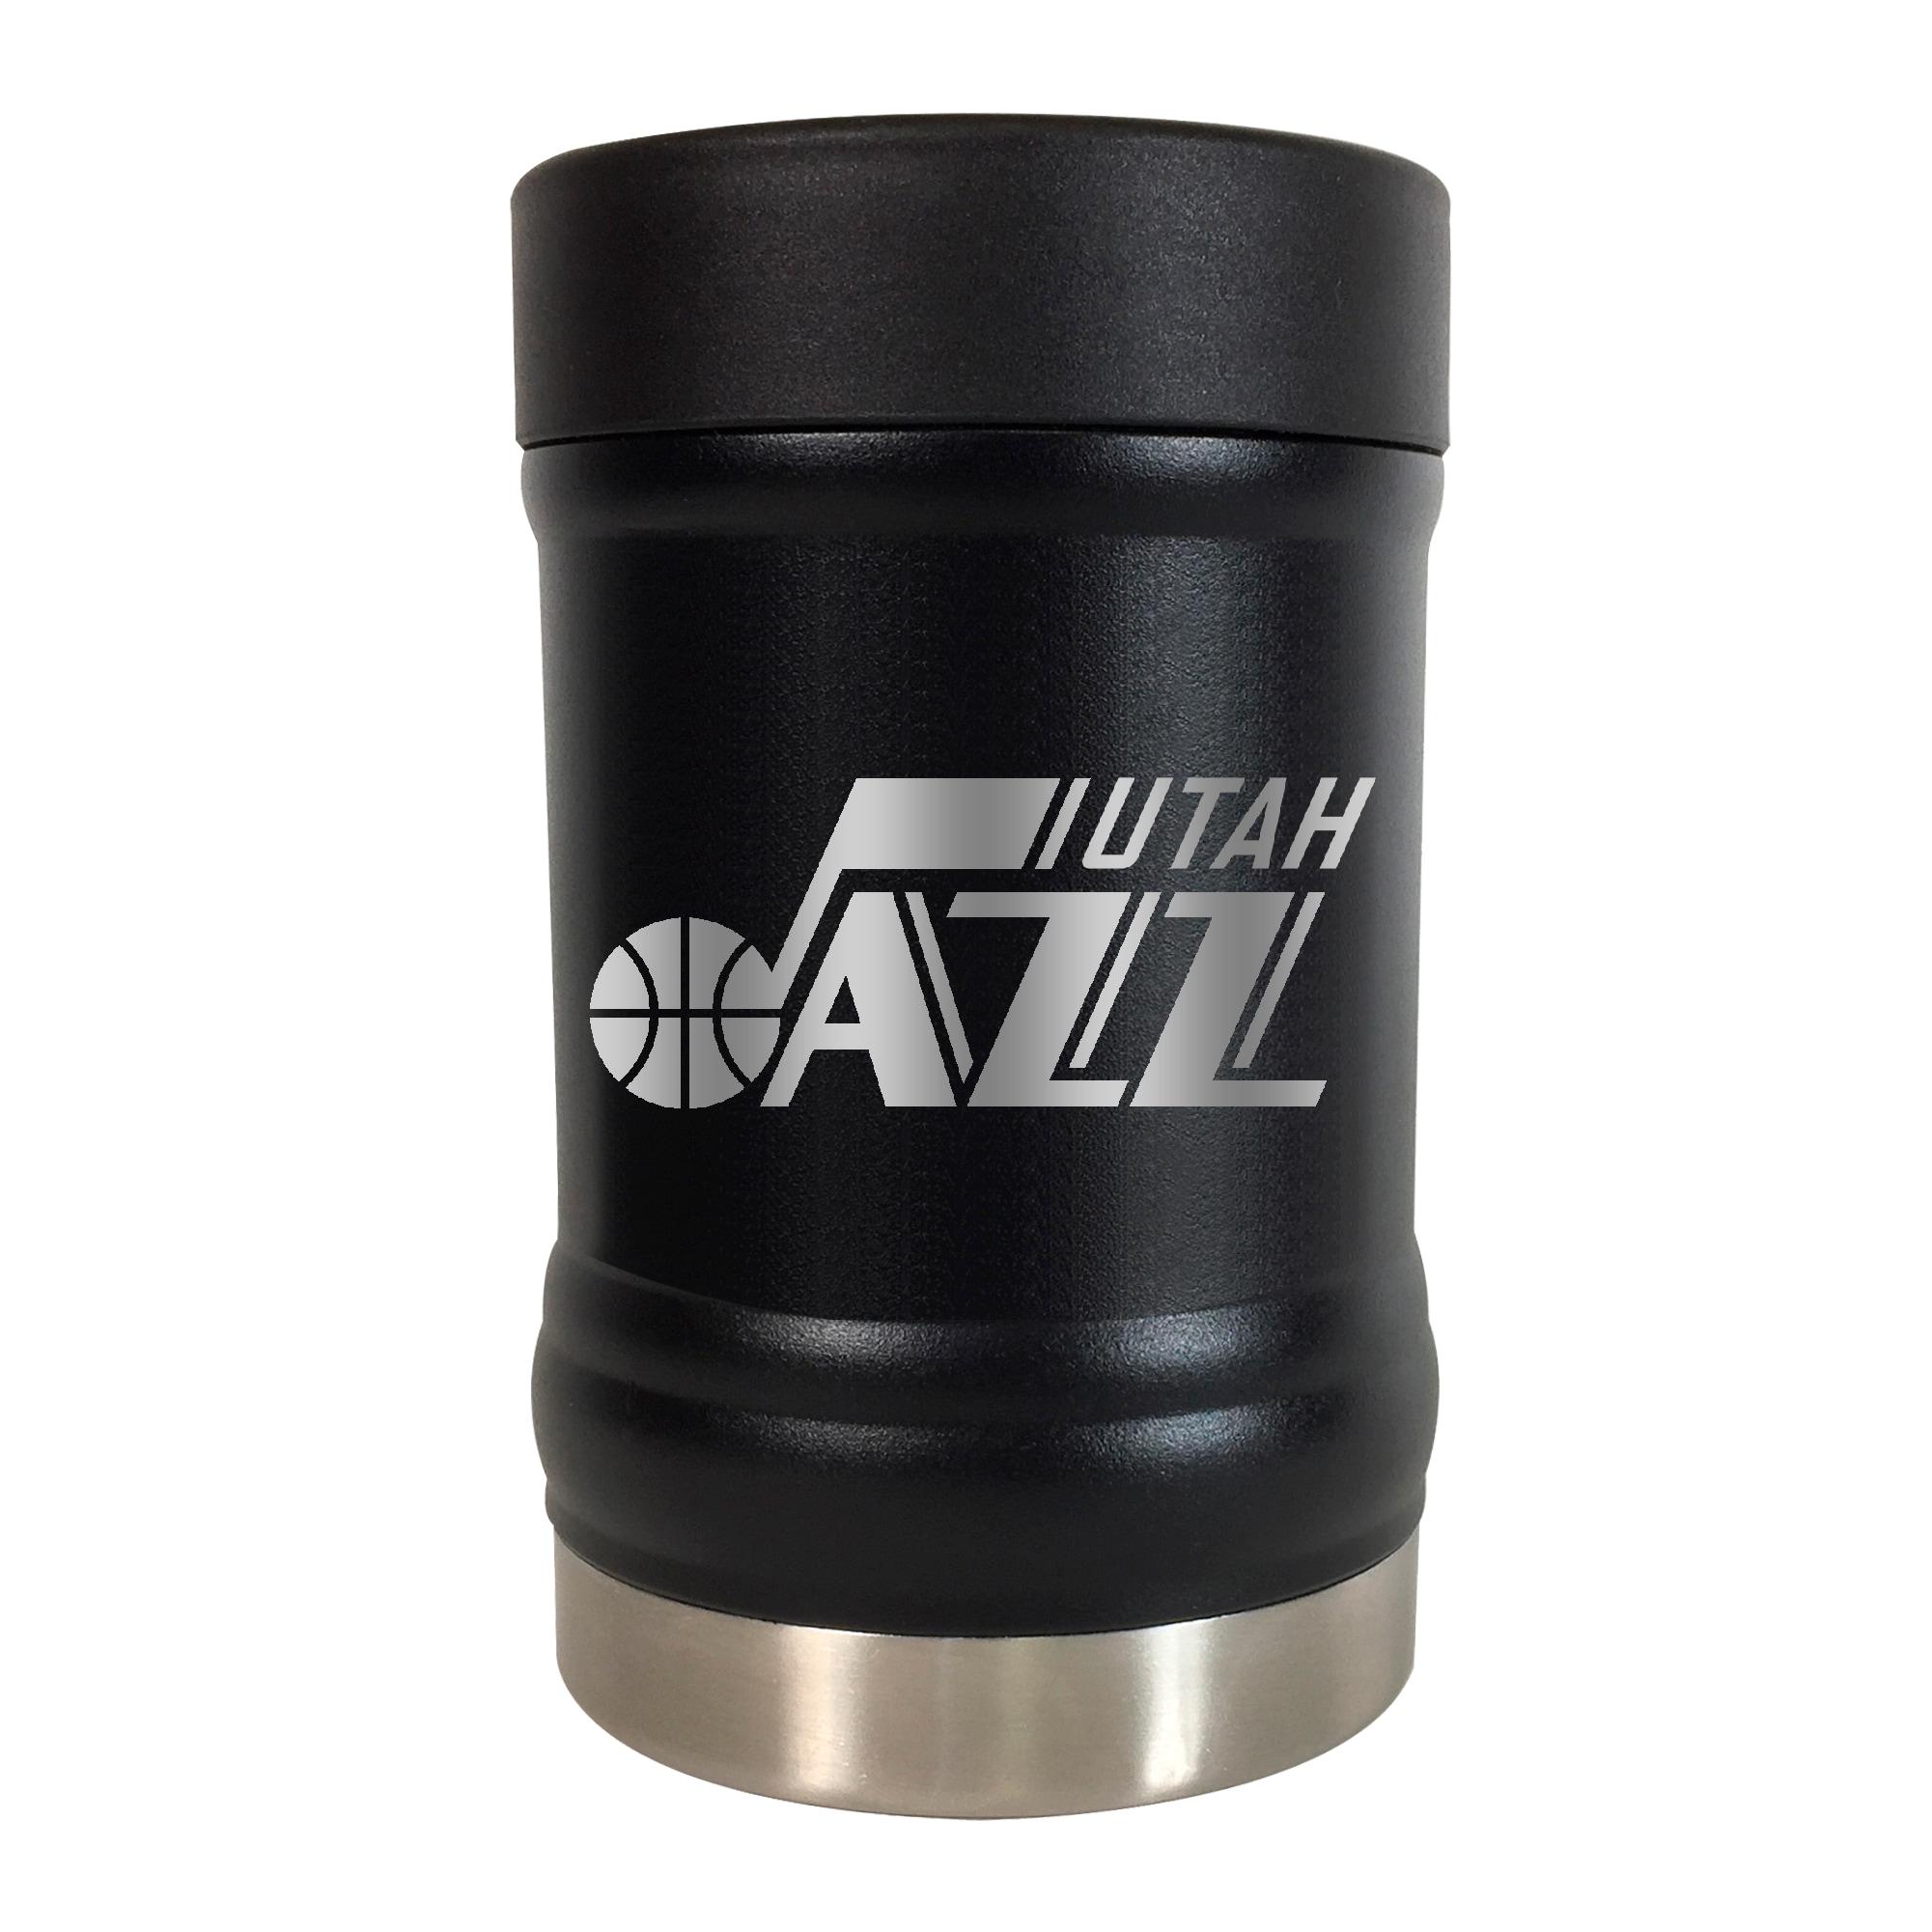 Utah Jazz 12oz. Stealth Can Holder